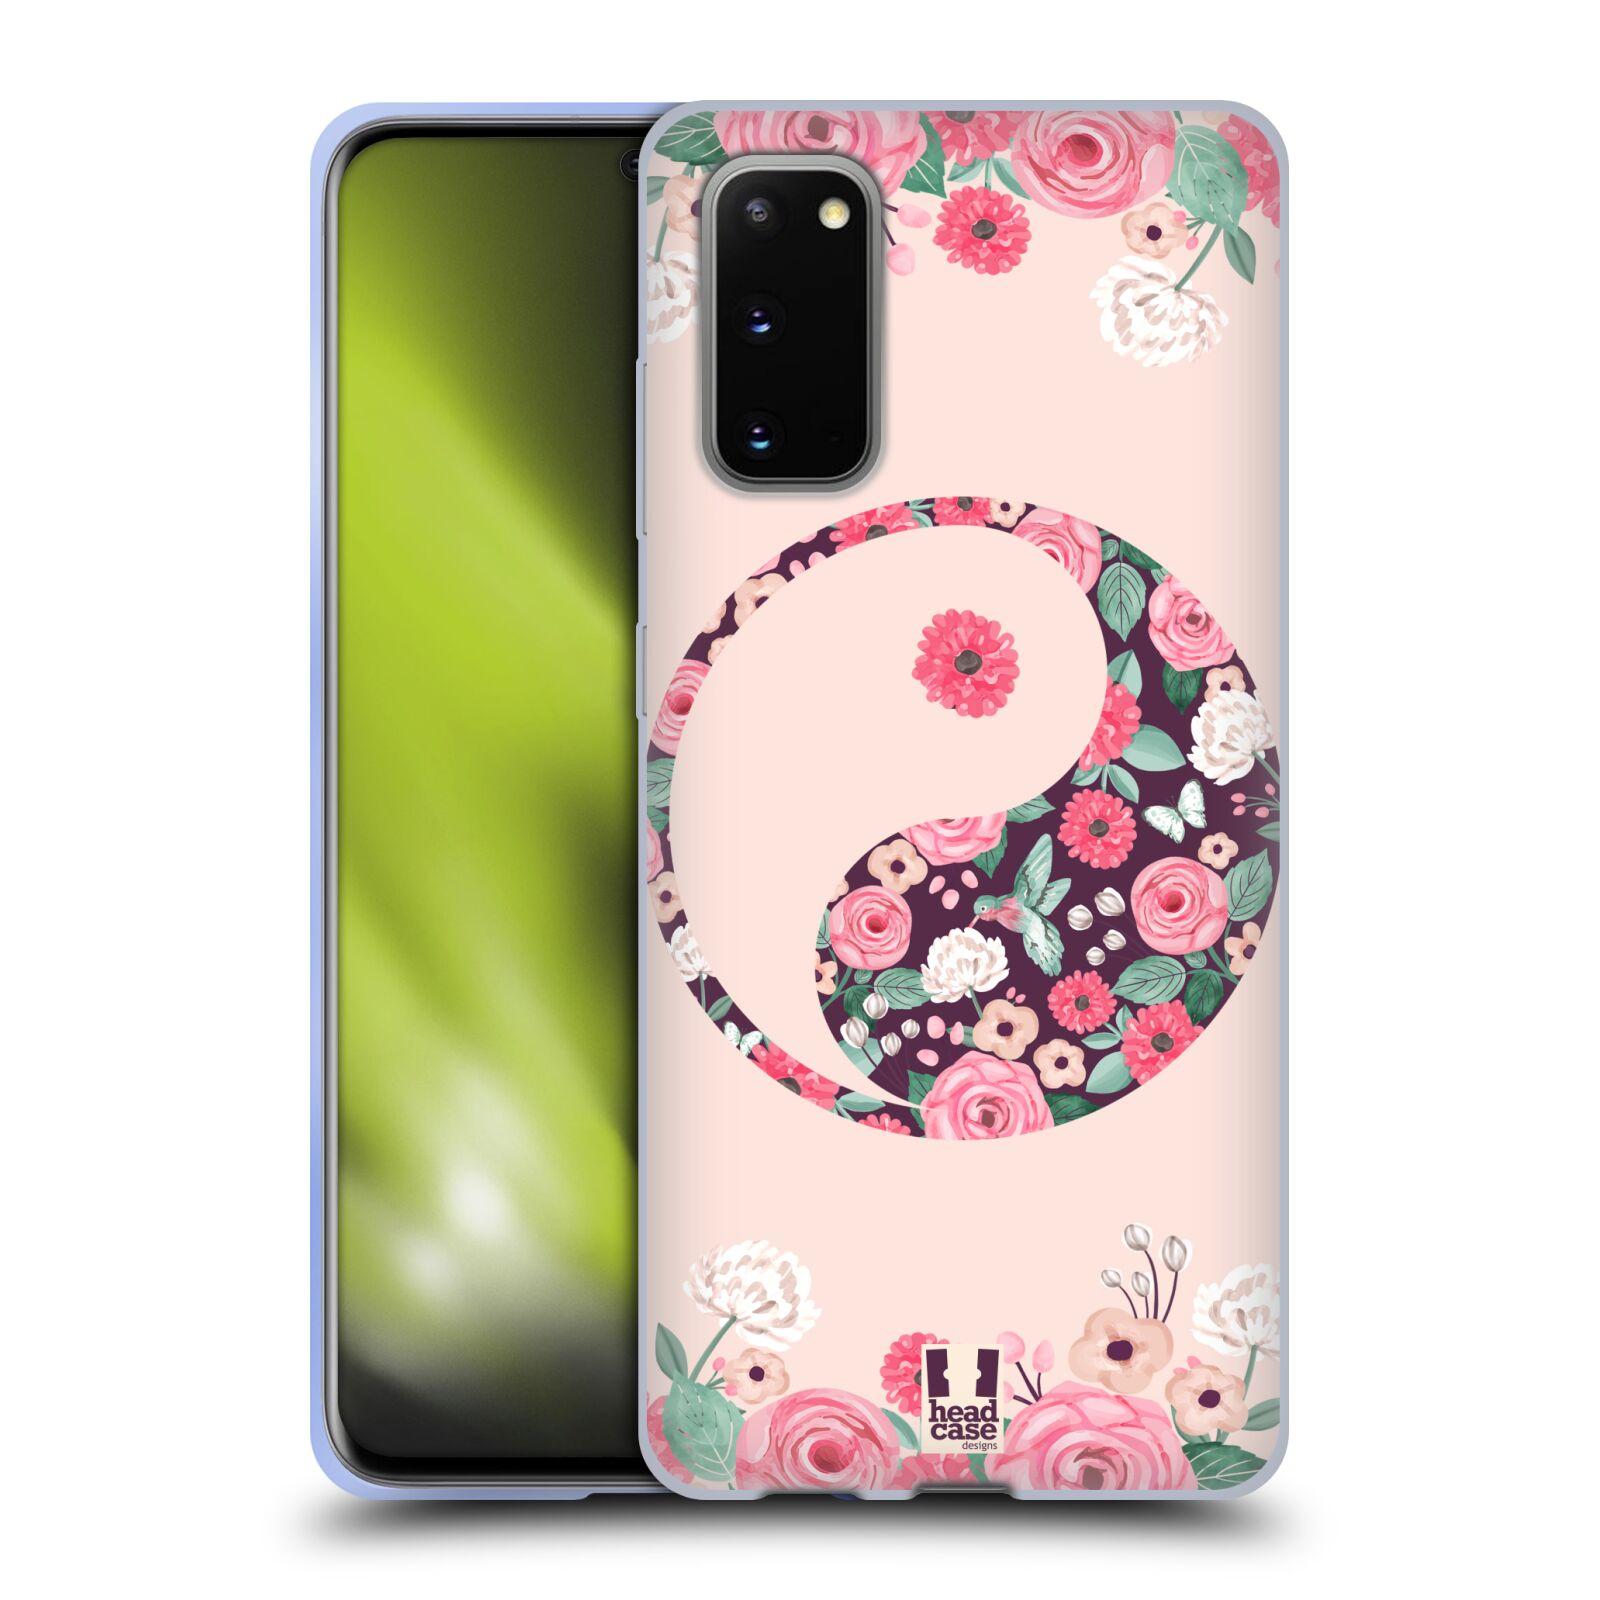 Silikonové pouzdro na mobil Samsung Galaxy S20 - Head Case - Yin a Yang Floral